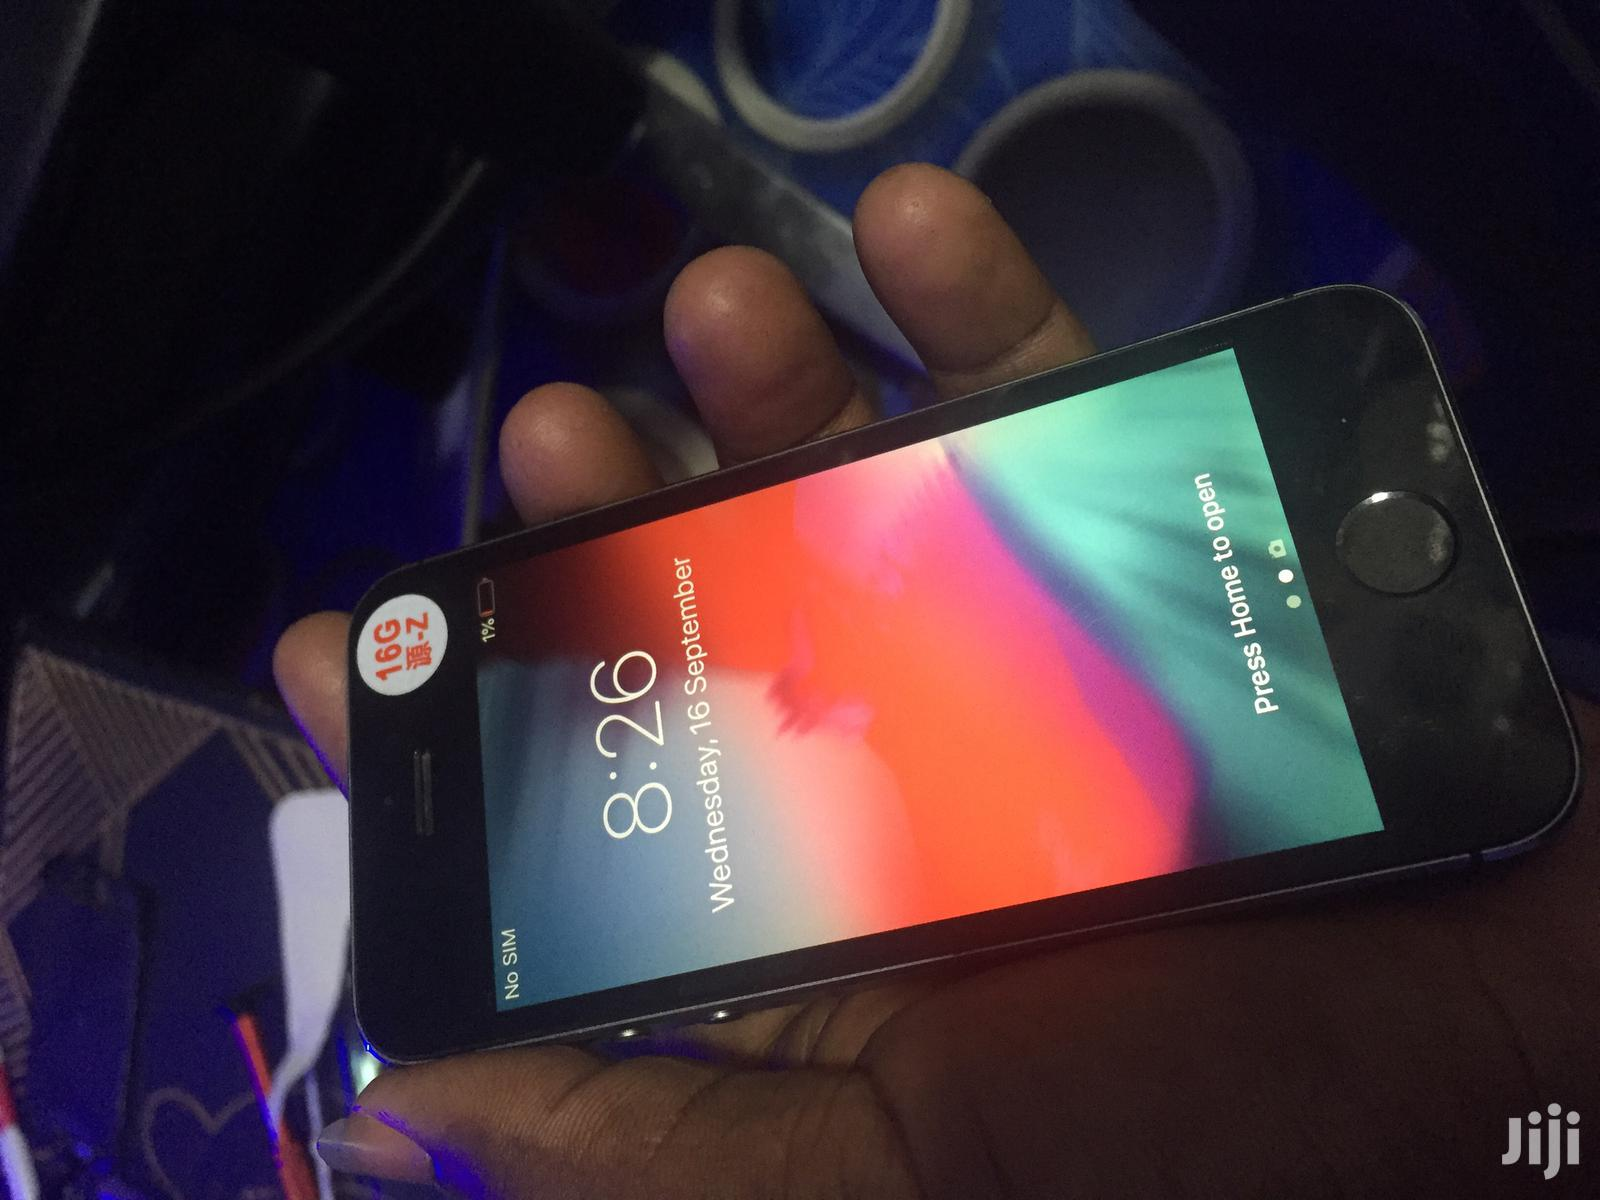 Apple iPhone 5s 16 GB Gray   Mobile Phones for sale in Accra Metropolitan, Greater Accra, Ghana